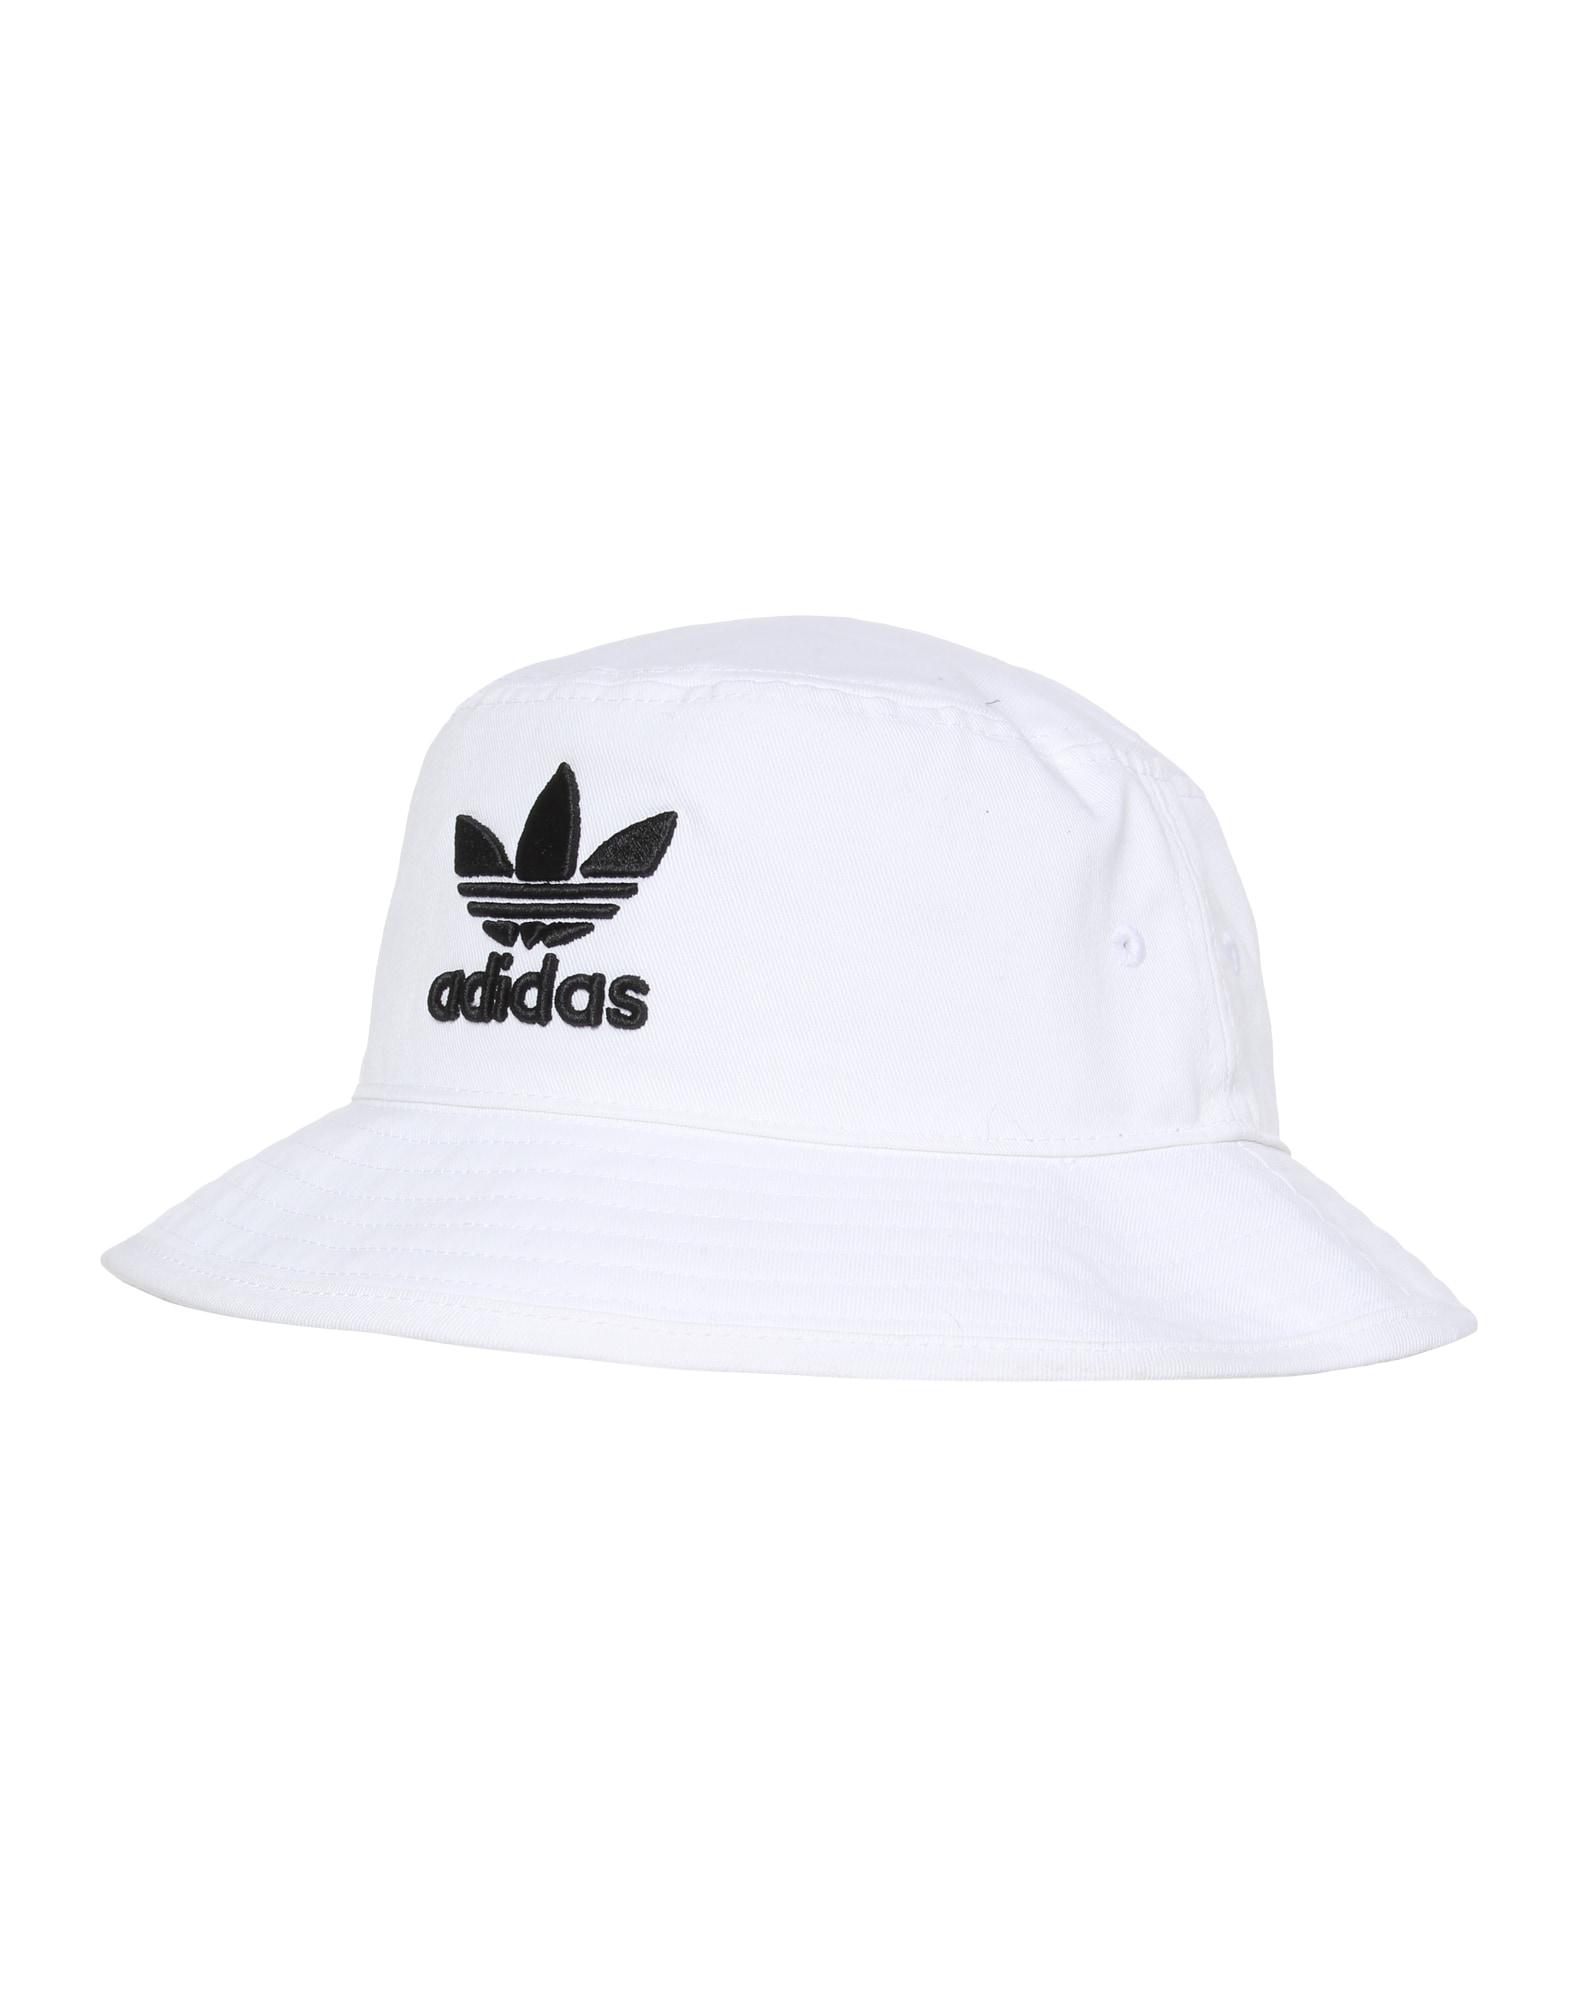 ADIDAS ORIGINALS Skrybėlaitė balta / juoda